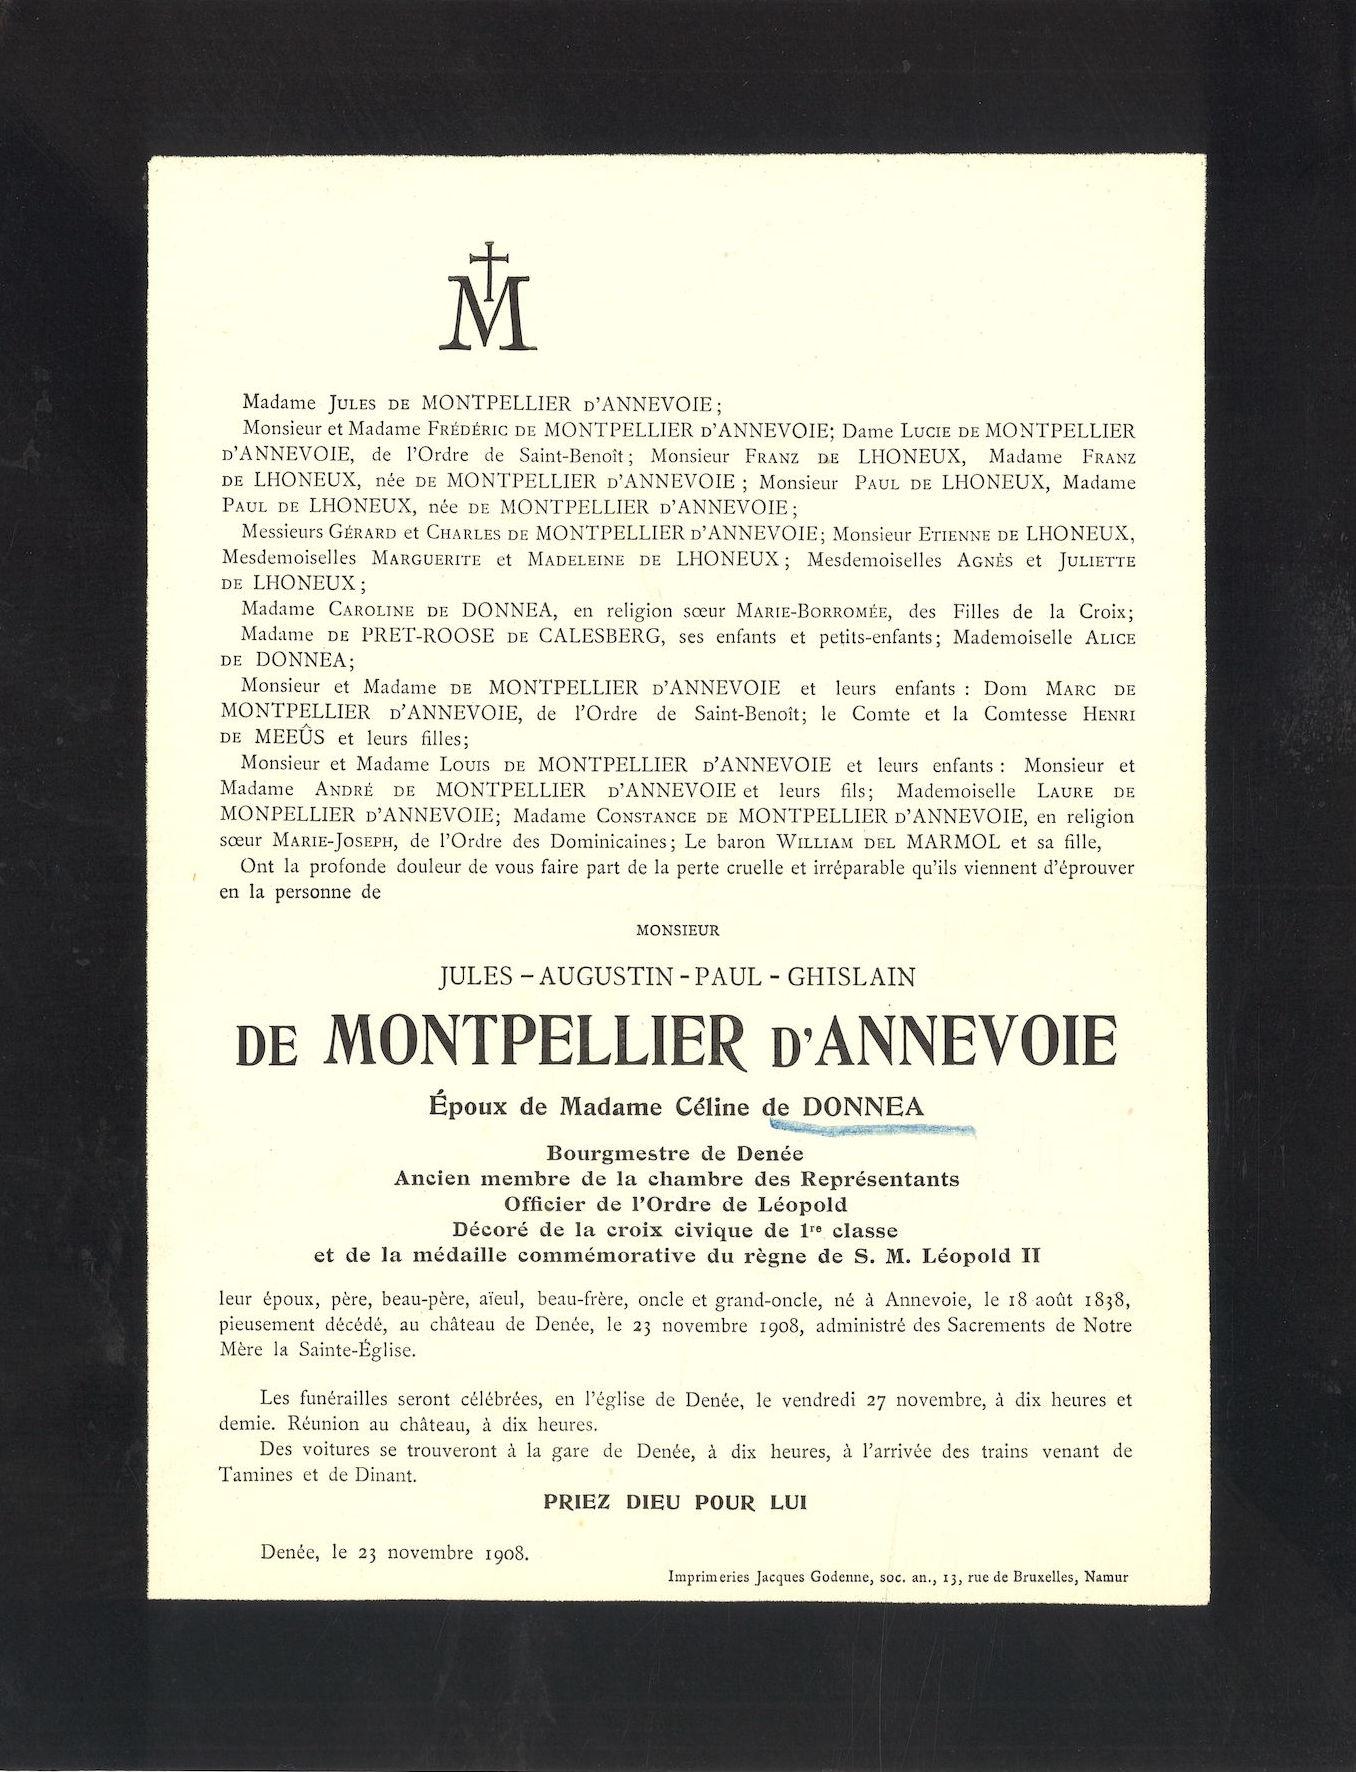 Jules-Augustin-Paul-Ghislain de Montpellier d' Annevoie